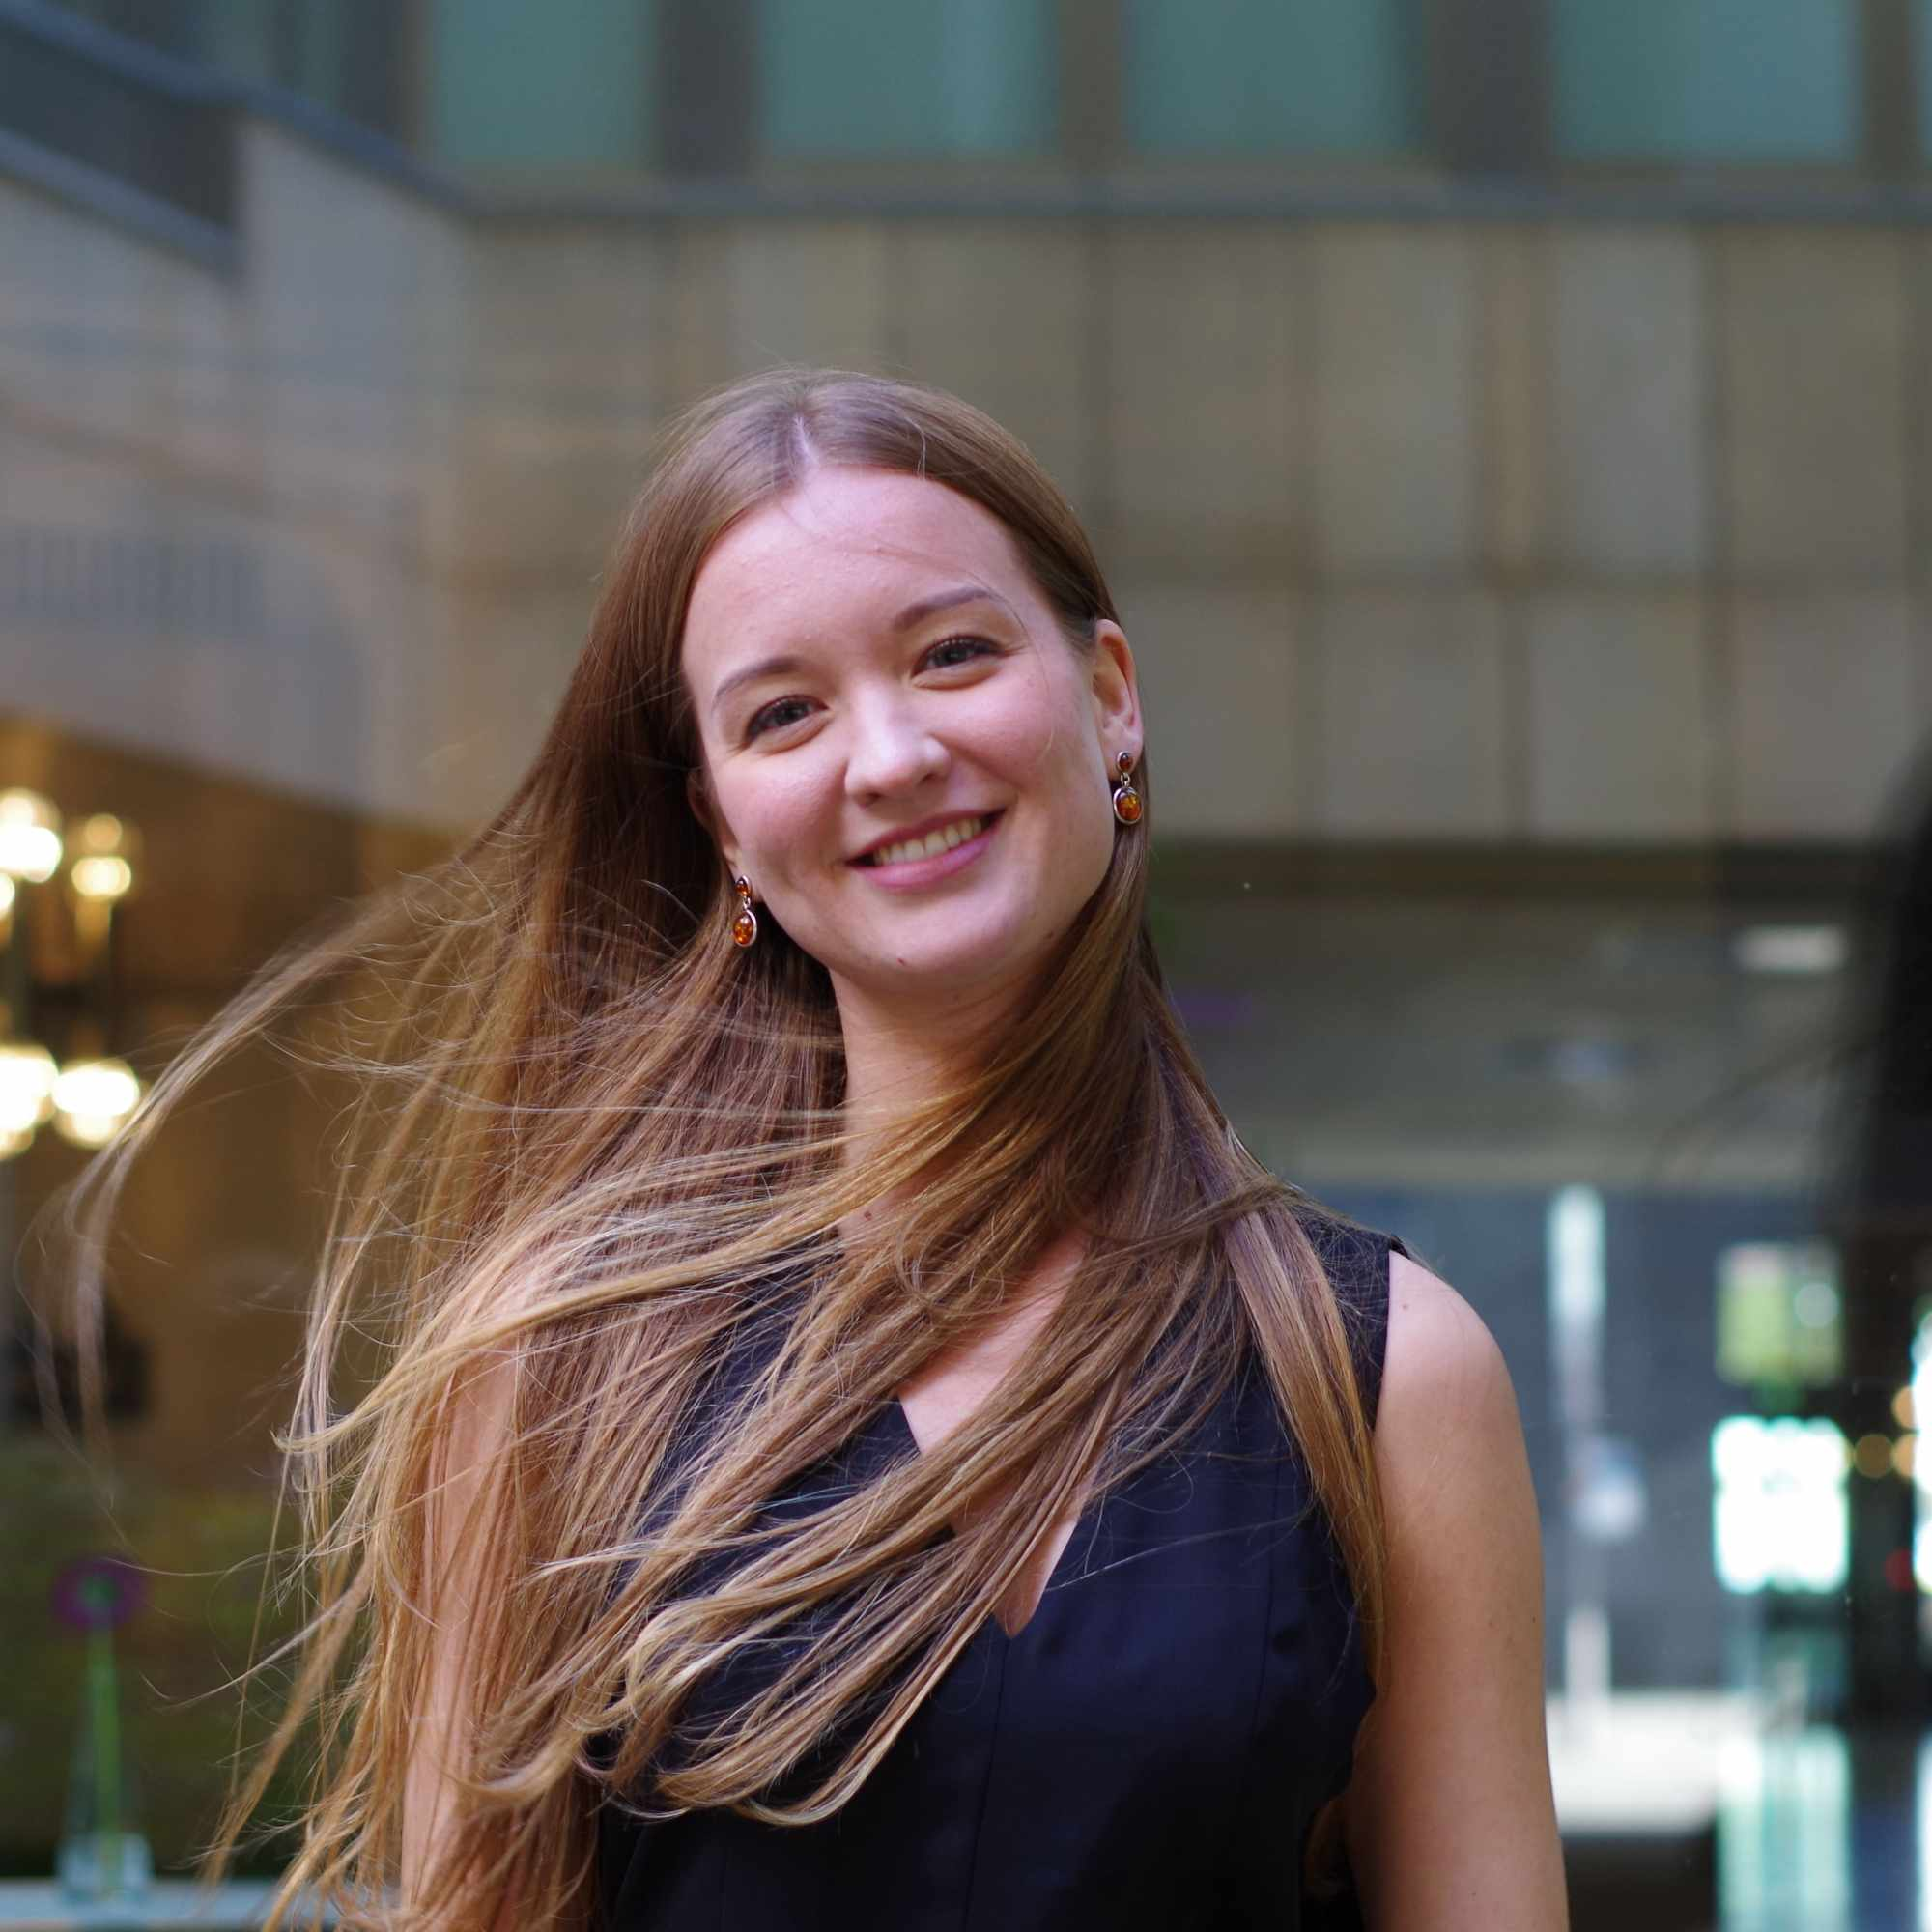 Ebba Lejonklo